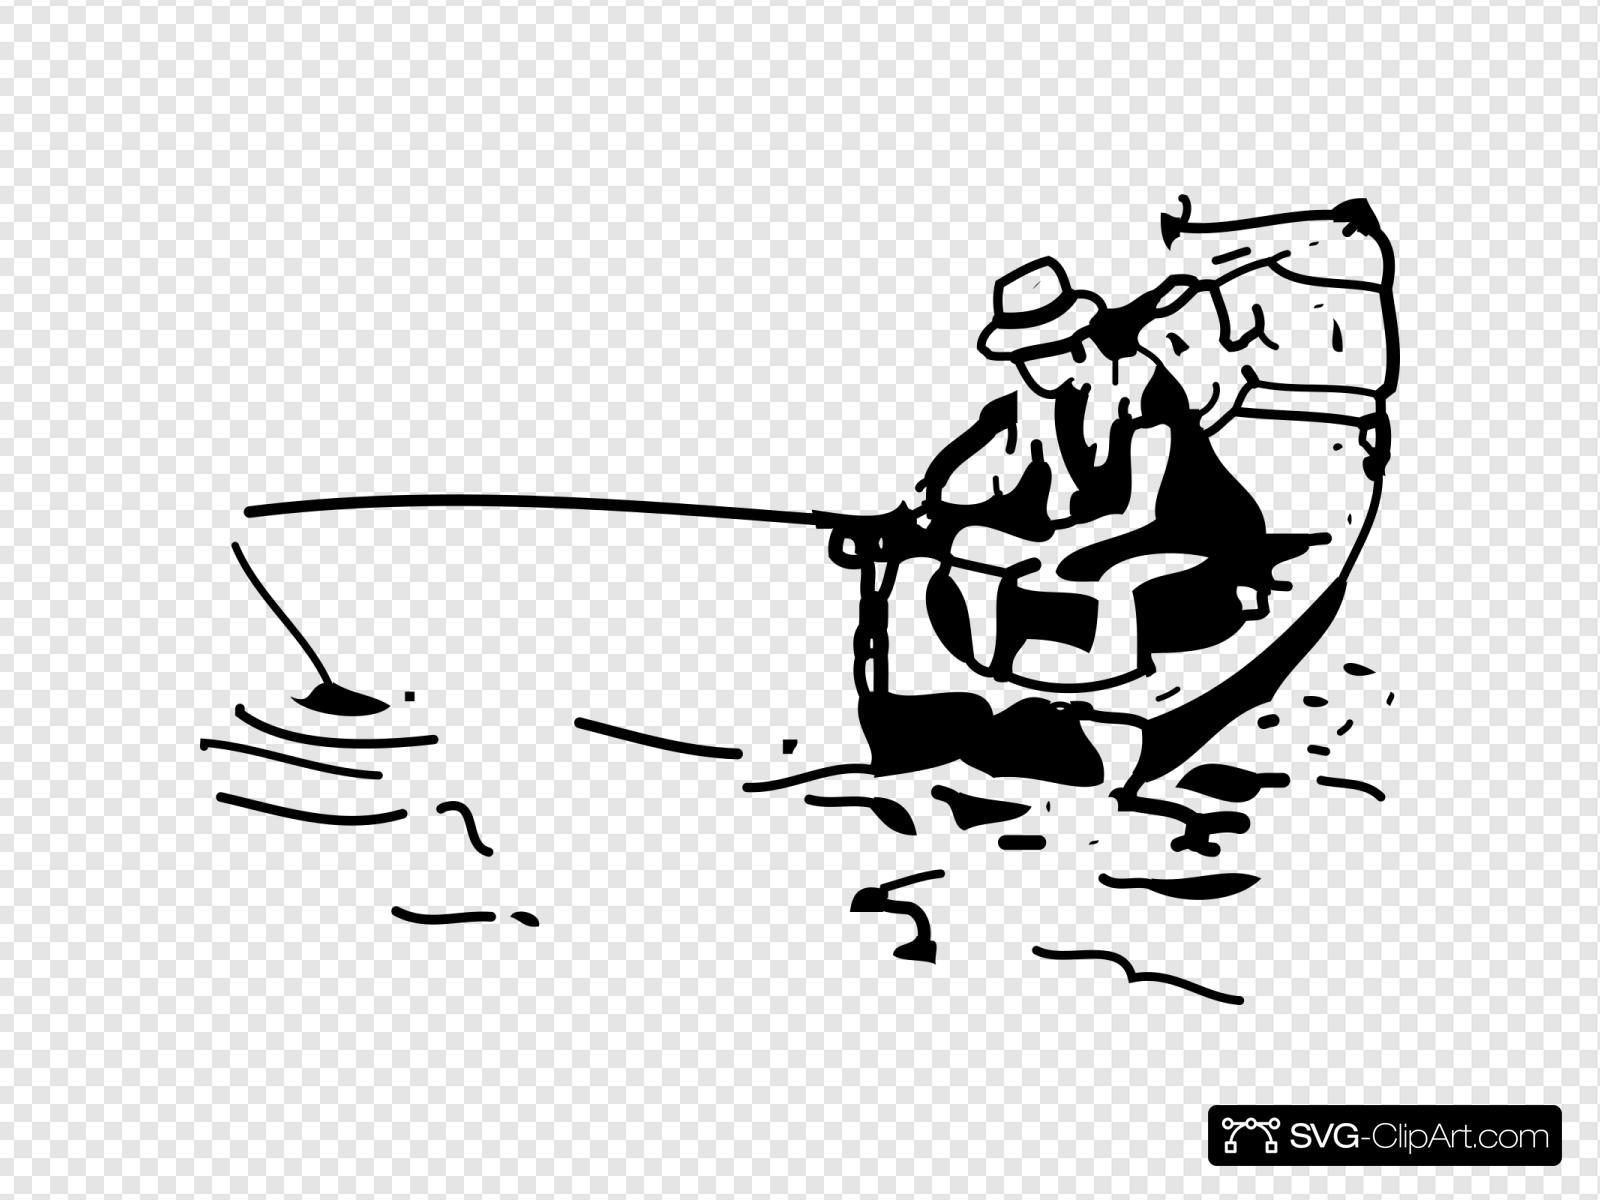 Download Fishing Boat Svg Vector Fishing Boat Clip Art Svg Clipart